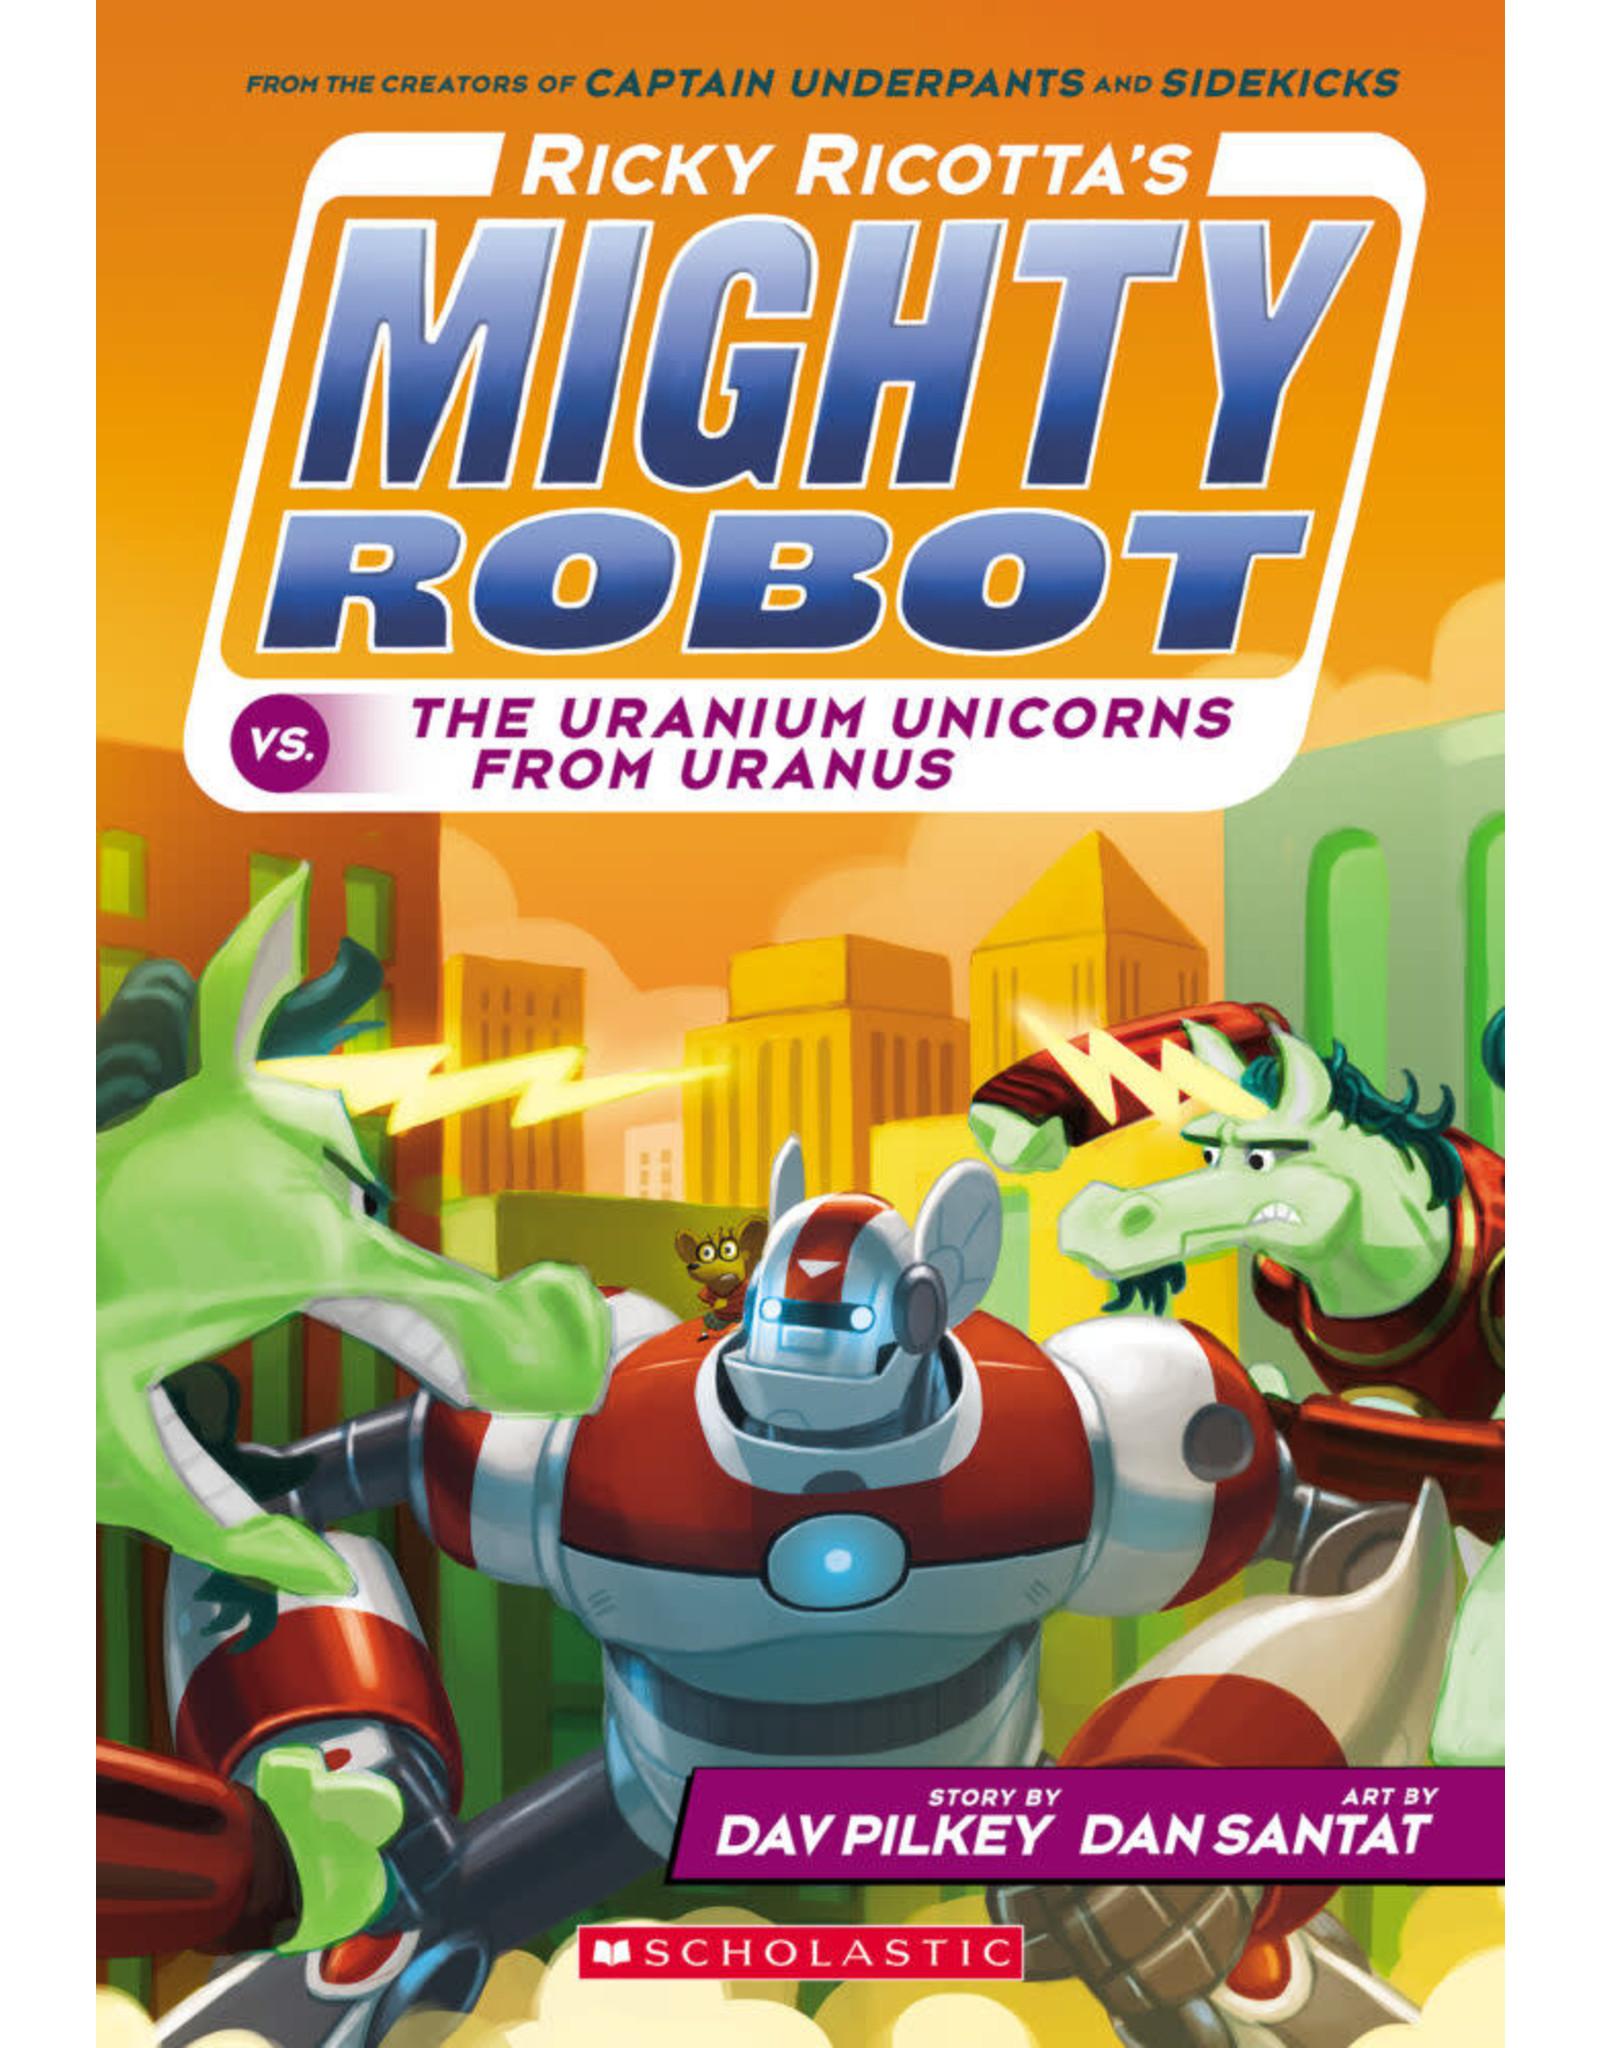 SCHOLASTIC INC. RICKY RICOTTAS MIGHTY ROBOT TP VOL 07 VS THE URANIUM UNICORNS FROM URANUS